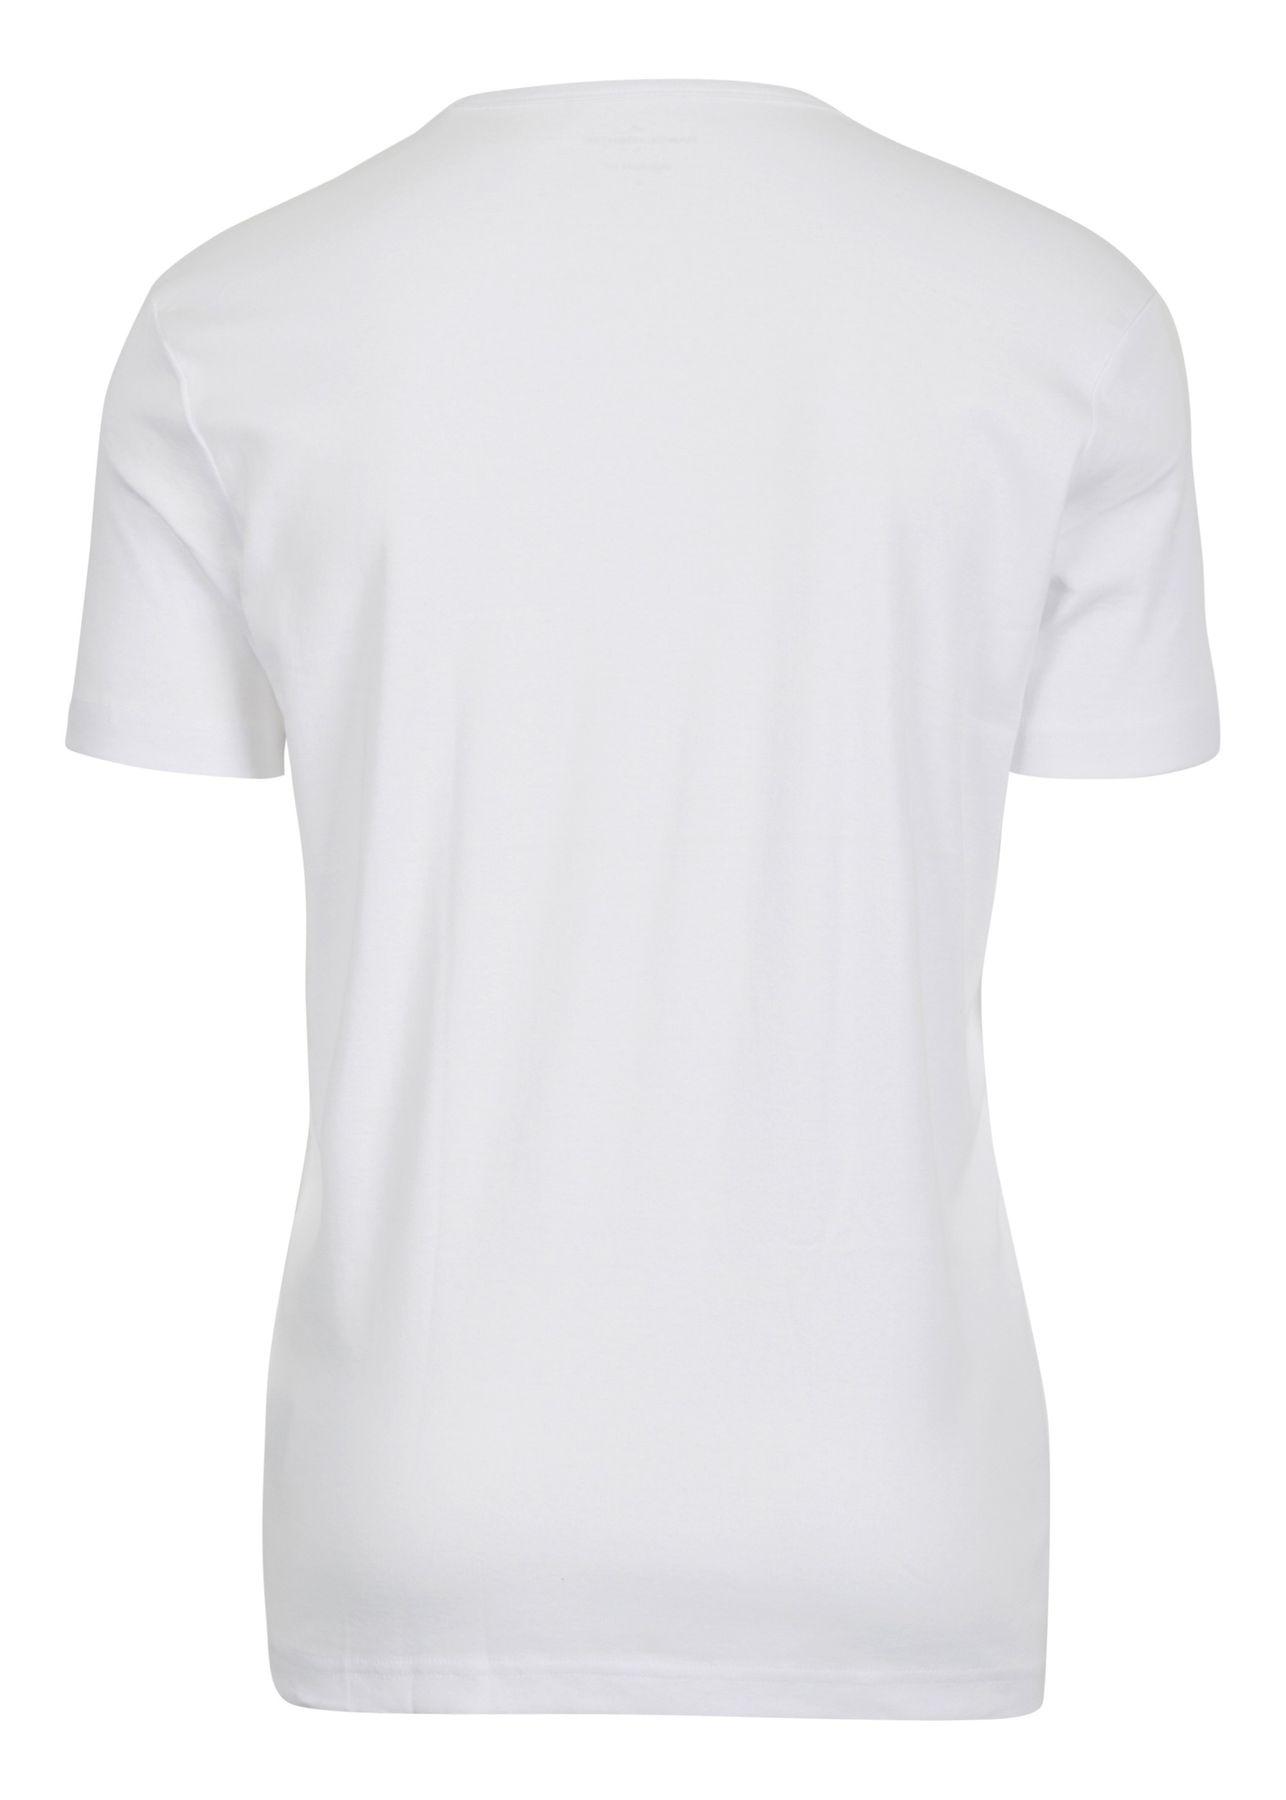 Daniel Hechter - Modern Fit -  Doppelpack Herren Kurzarm T-Shirt in weiß, S-3XL (474 10288) – Bild 3